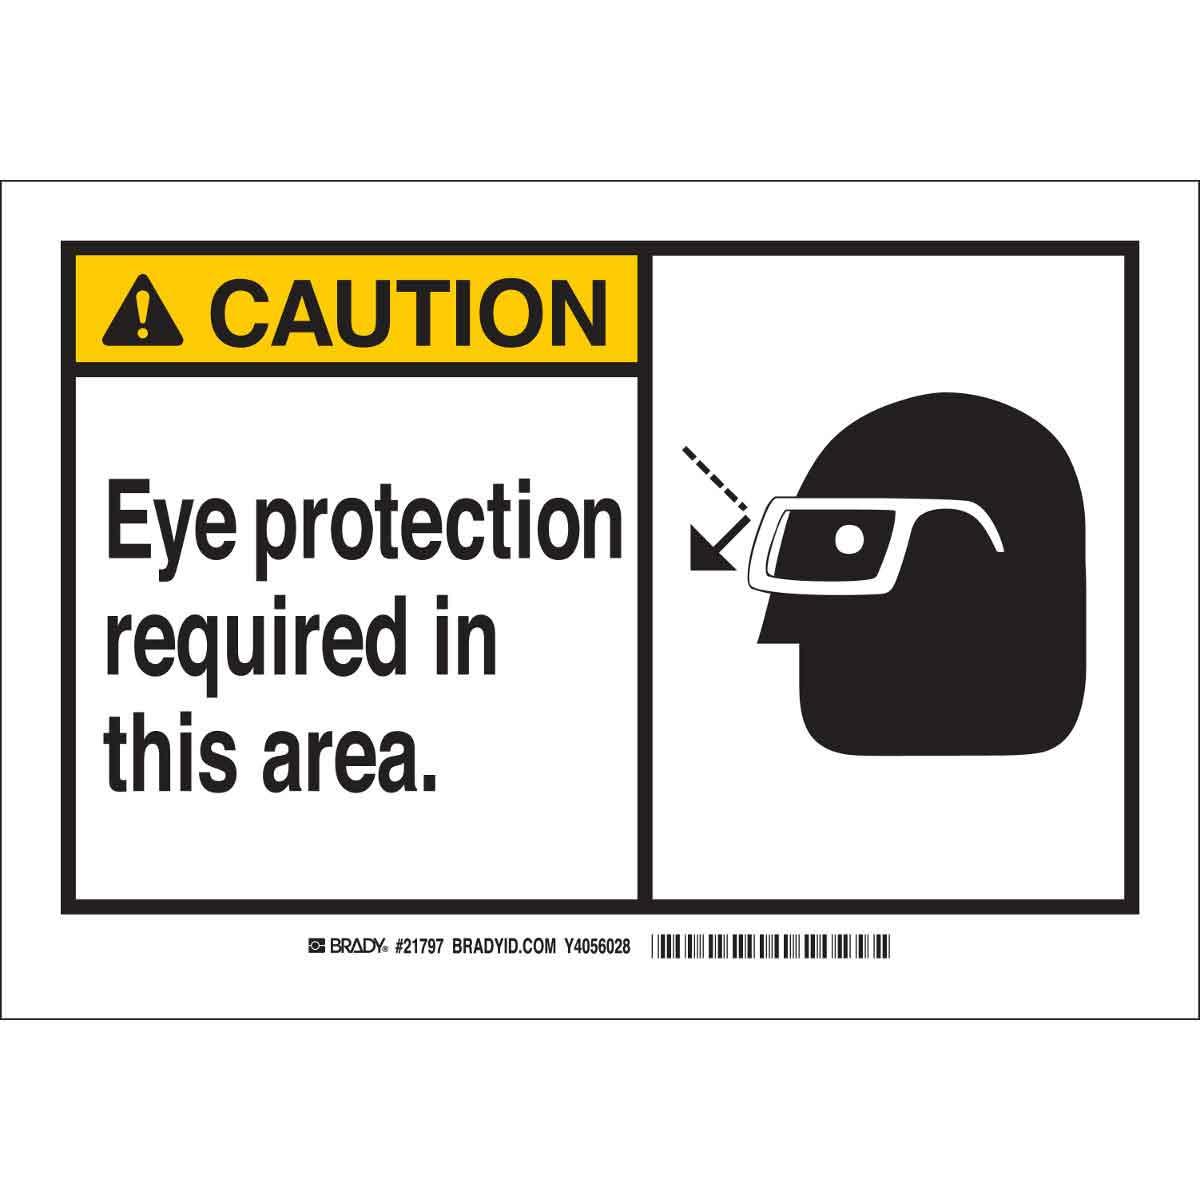 Brady® 26572 Rectangular Safety Sign, 10 in H x 14 in W, Black on Yellow, B-401 Polystyrene, Corner Holes Mount